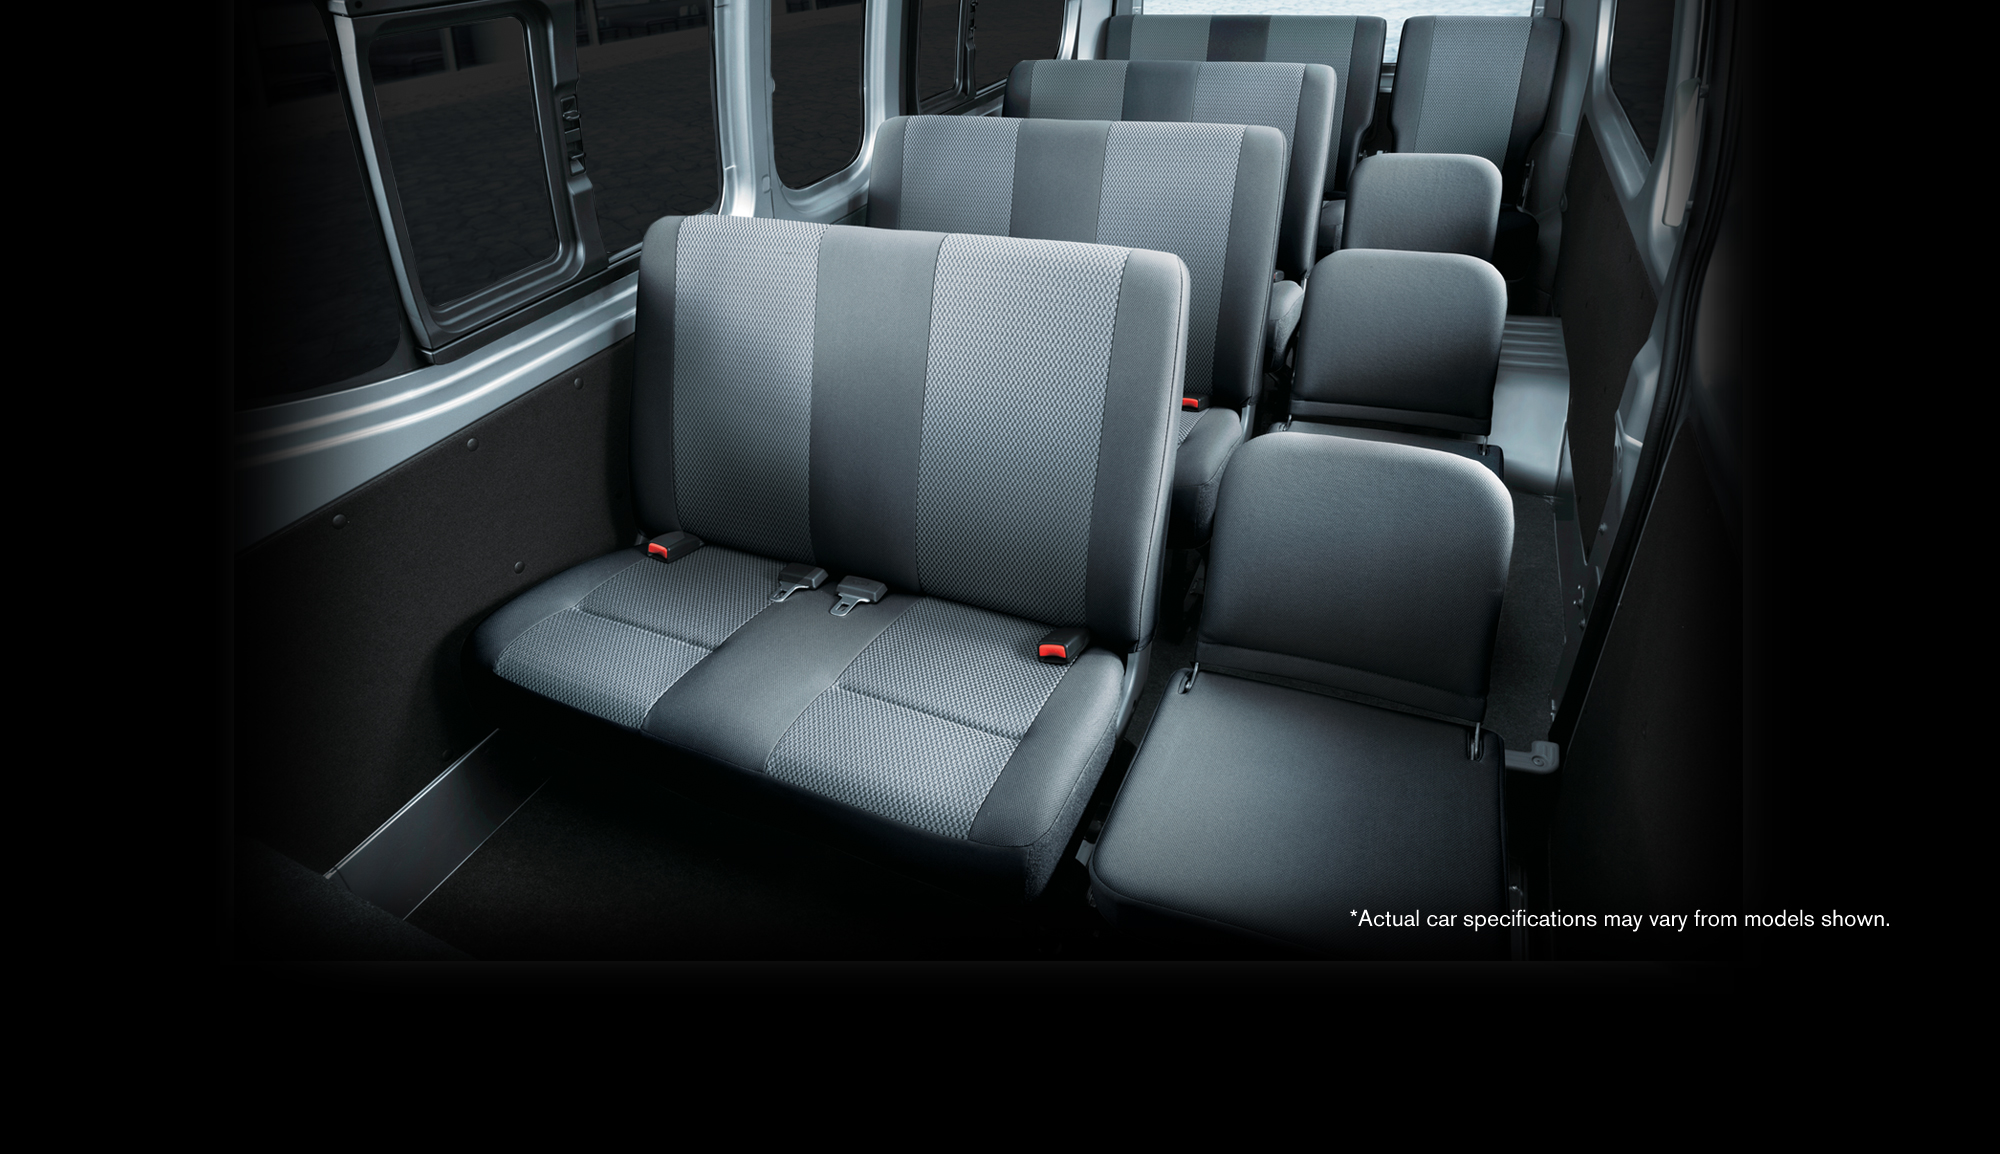 03_NV350 Urvan_14-Seater